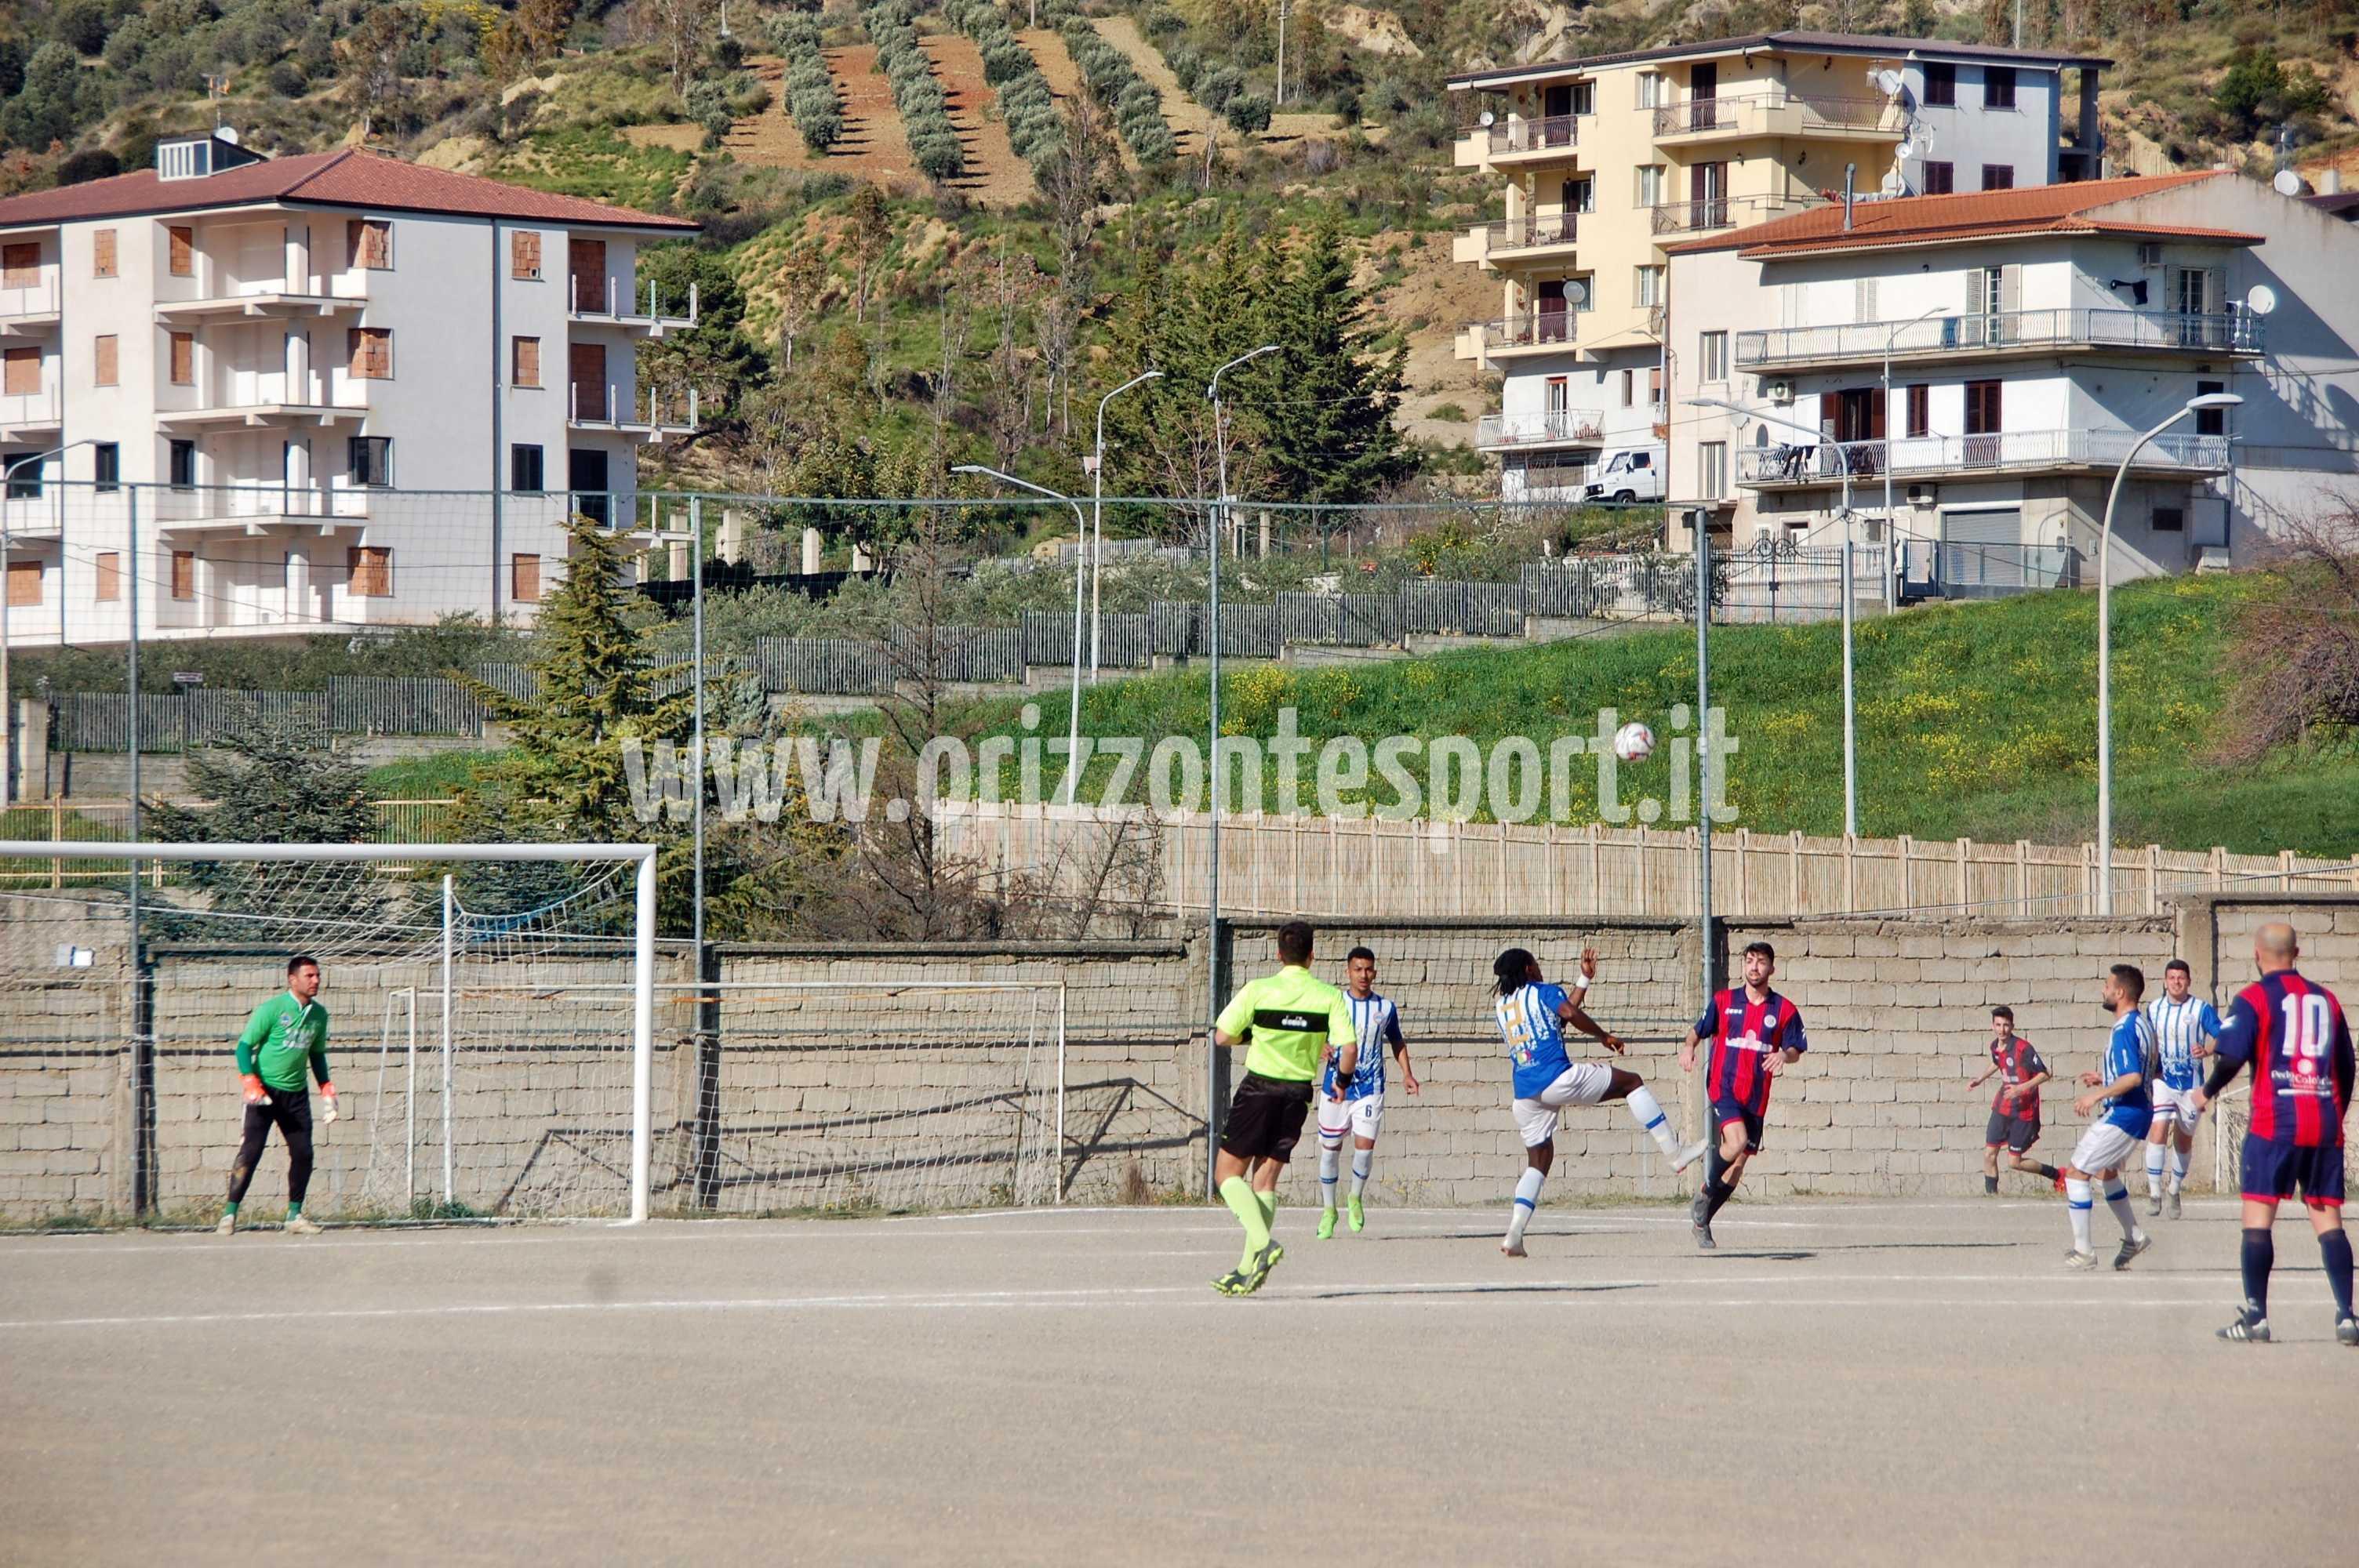 cassano_rossanese (45)